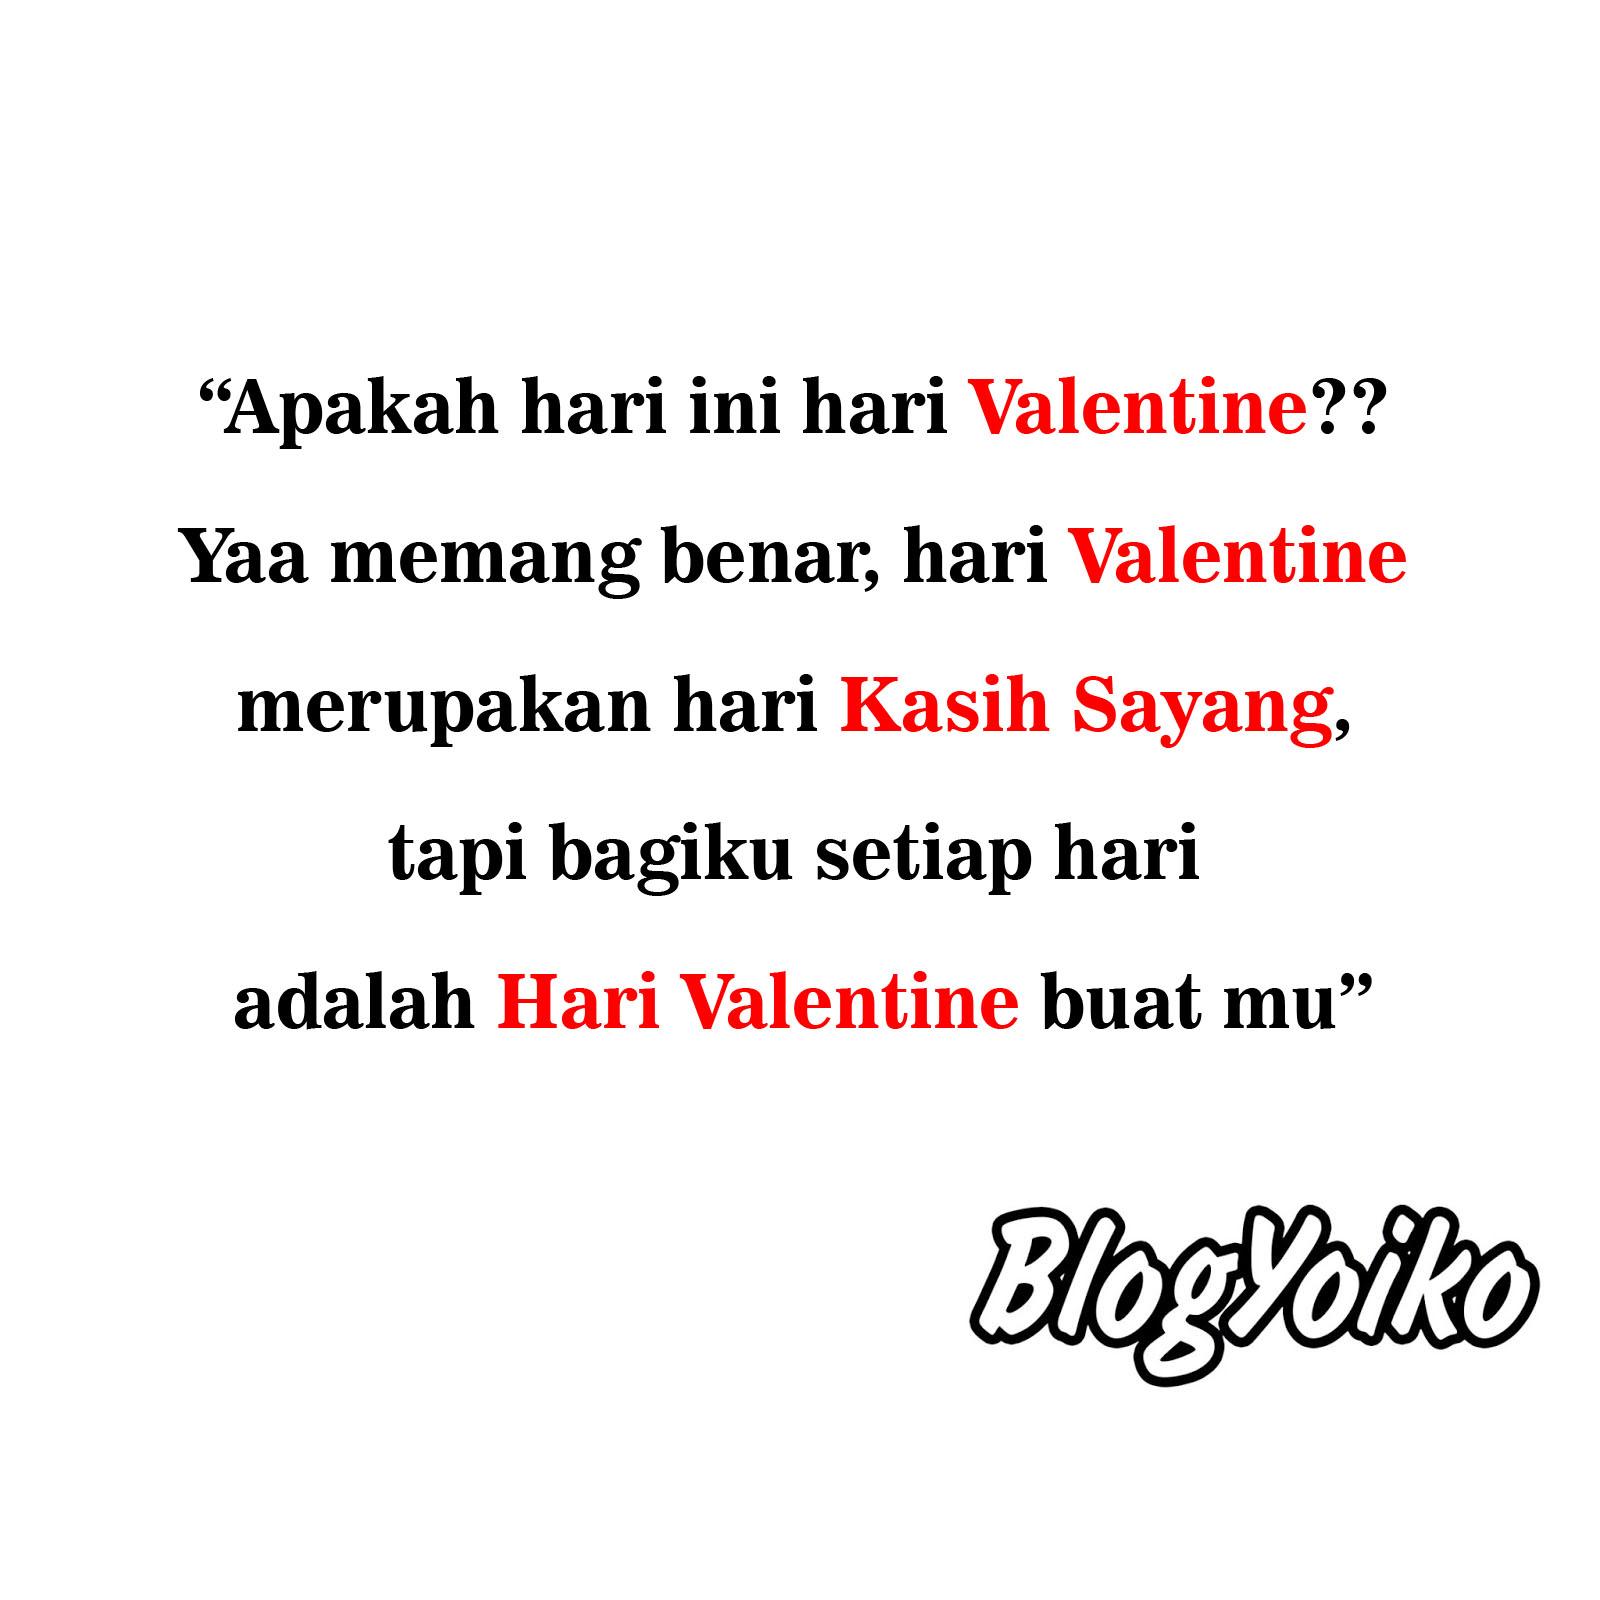 Kata Kata Ucapan Selamat Hari Valentine Untuk Pasangan Blog Yoiko